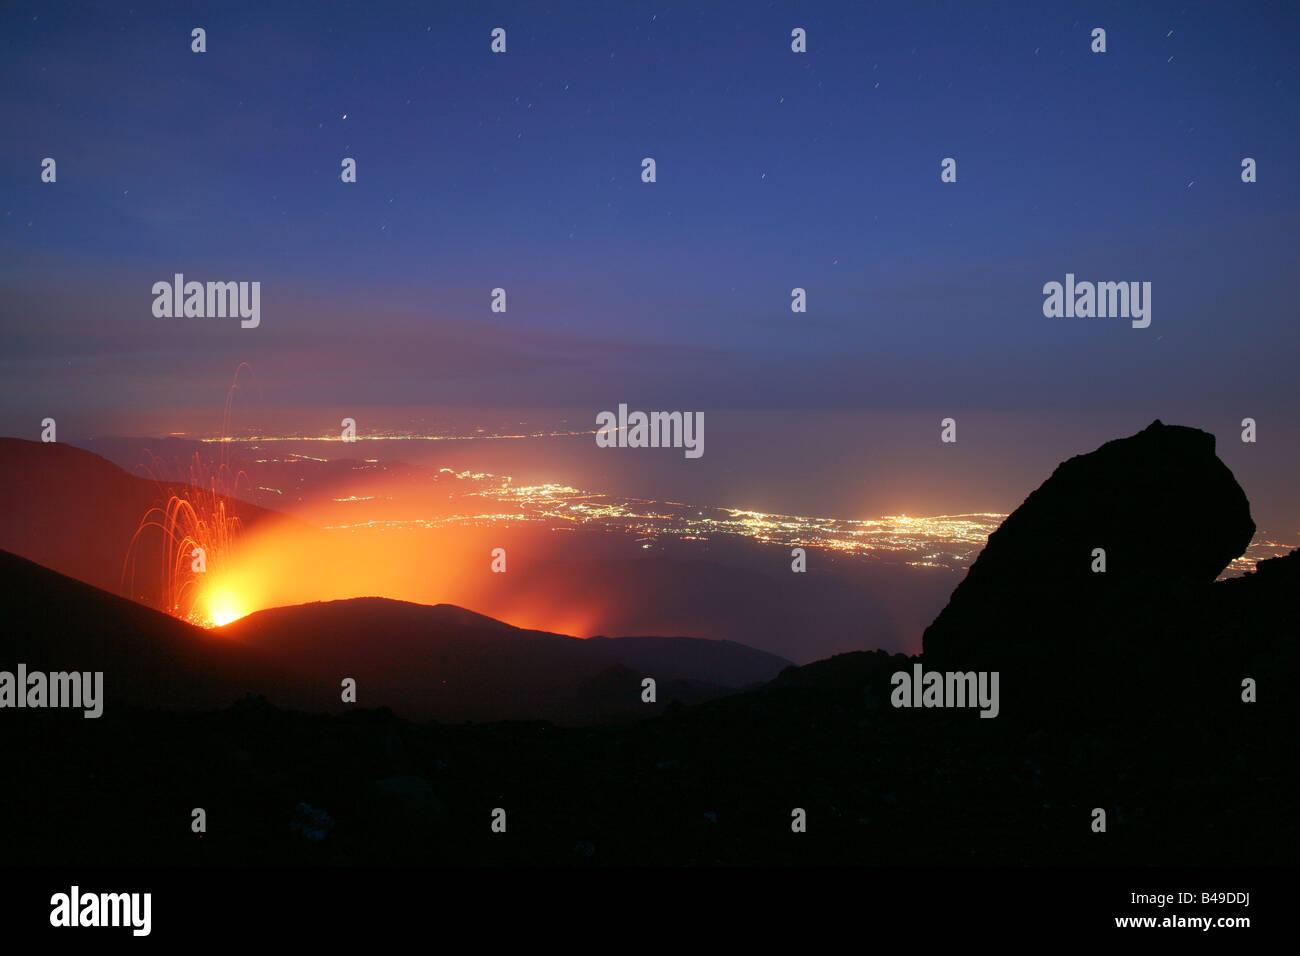 Eruption at Mt. Etna volcano - Stock Image